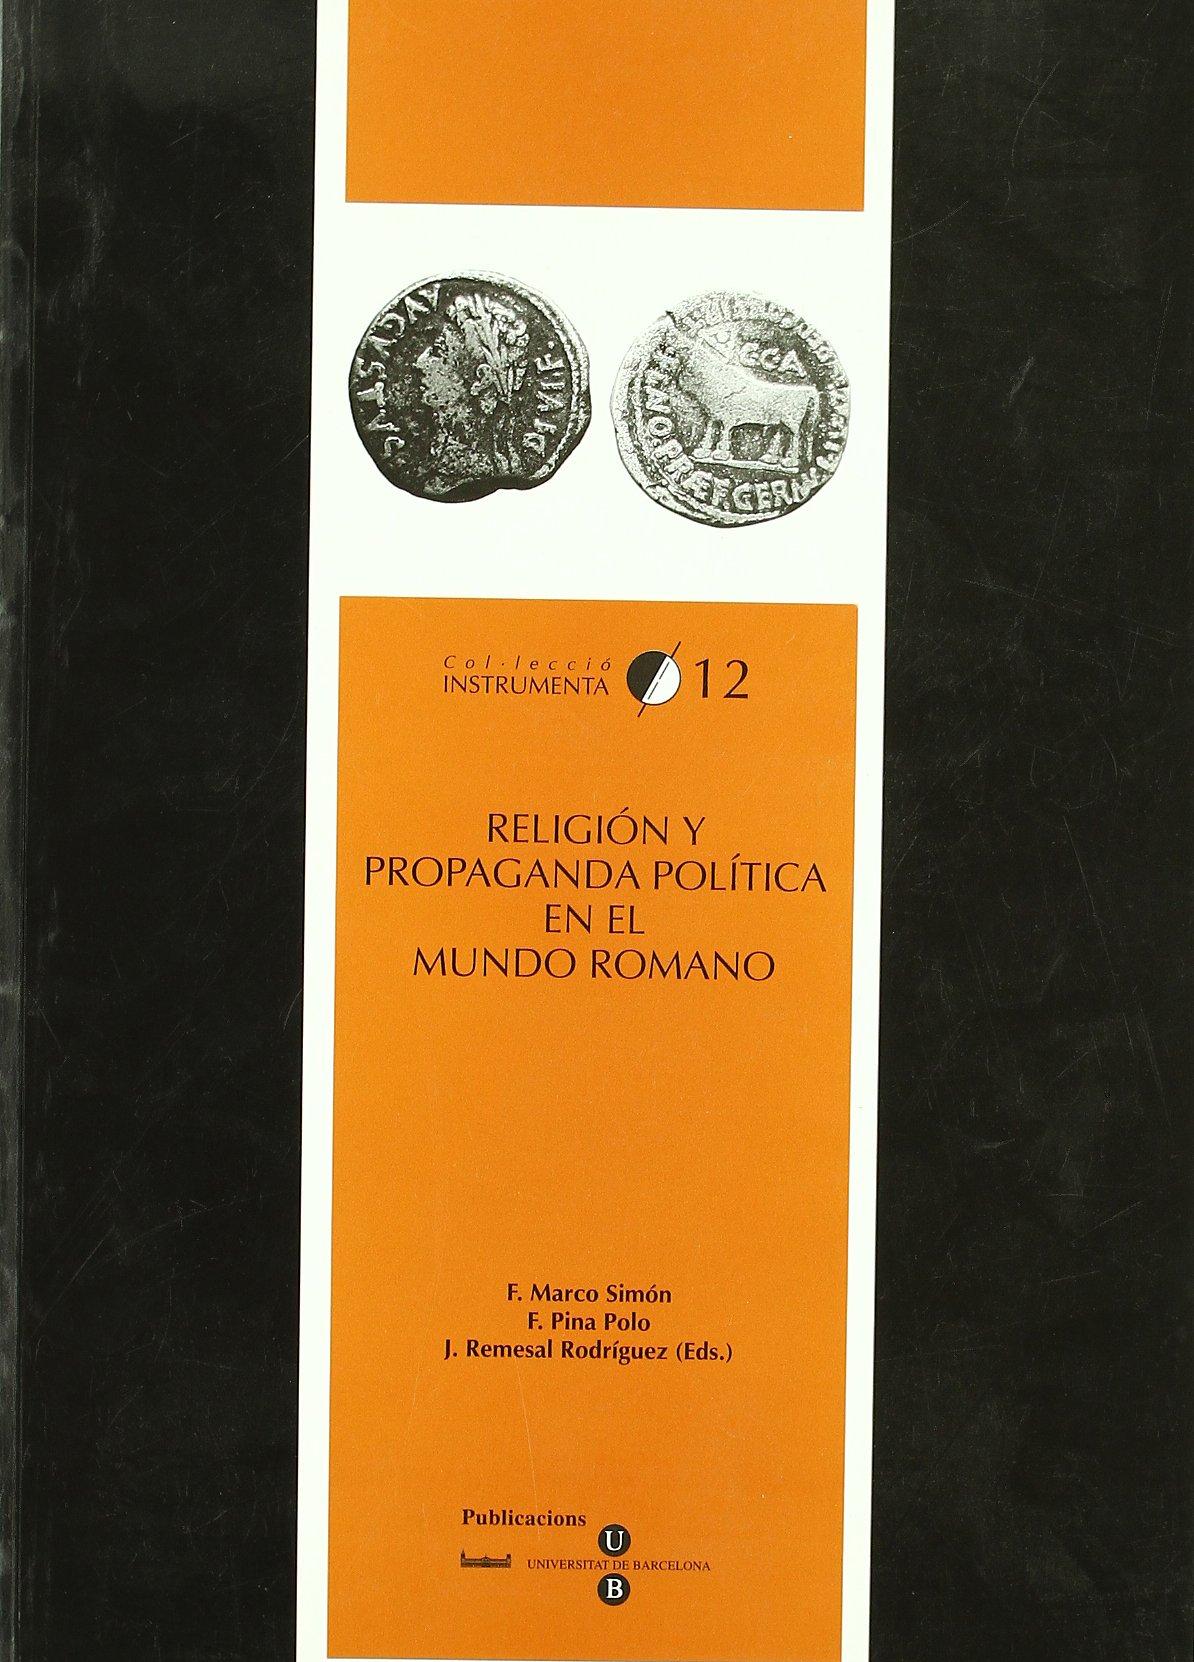 RELIGION Y PROPAGANDA POLITICA EN EL MUN: F. / F. PINA / J. REMESAL, EDS. MARCO: 9788447527236: Amazon.com: Books